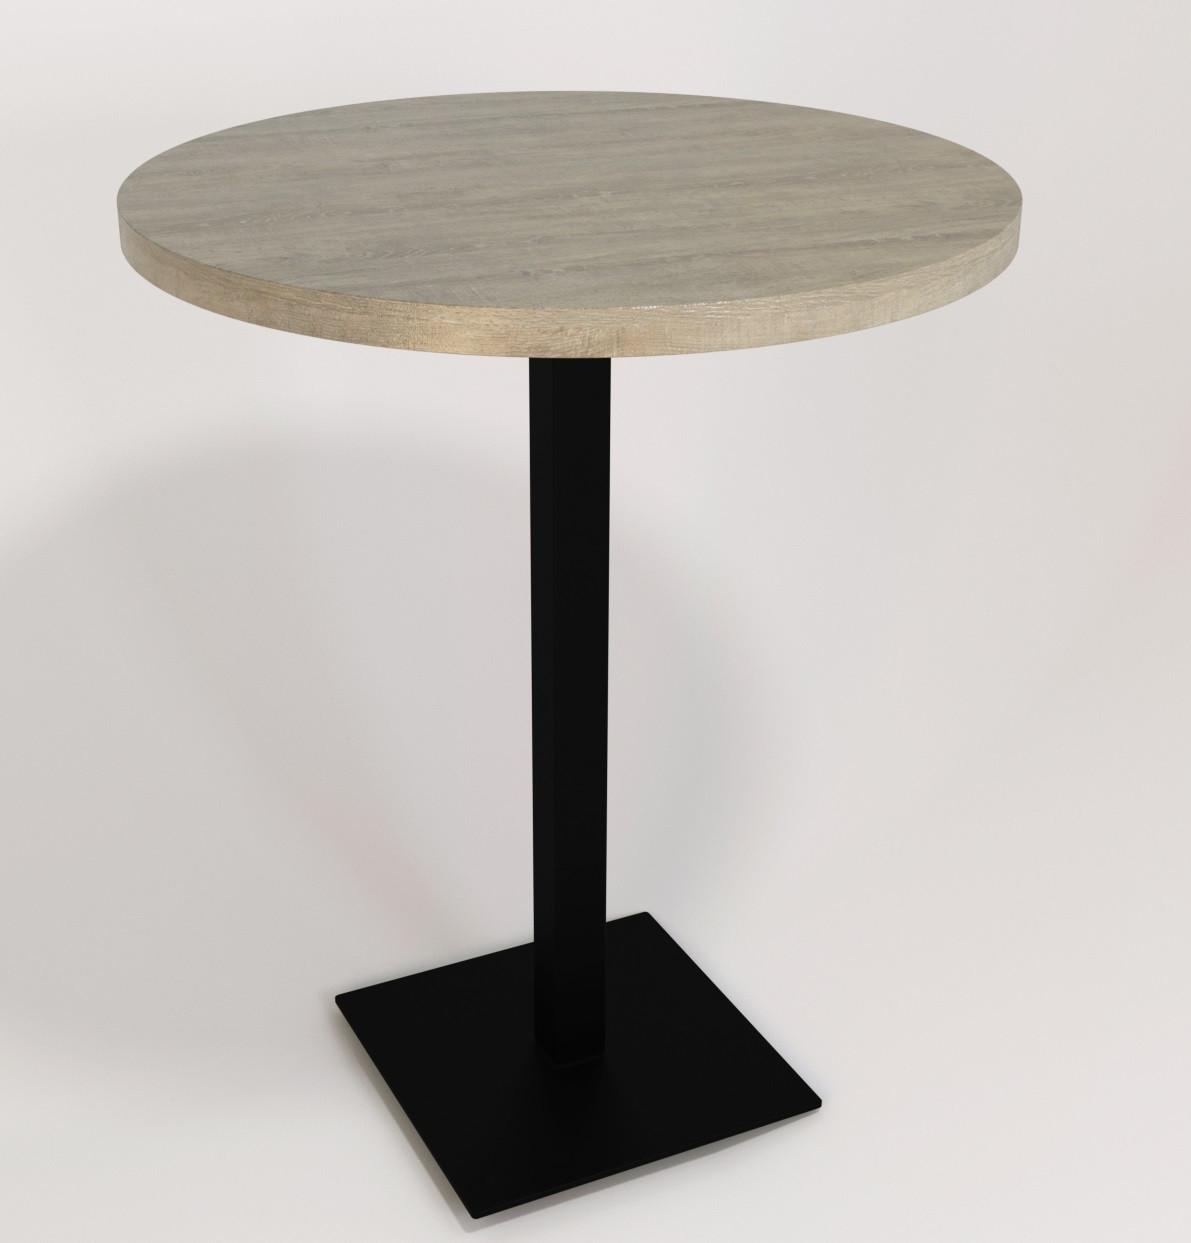 База для стола Тренд барный 1 ТМ Металл Дизайн